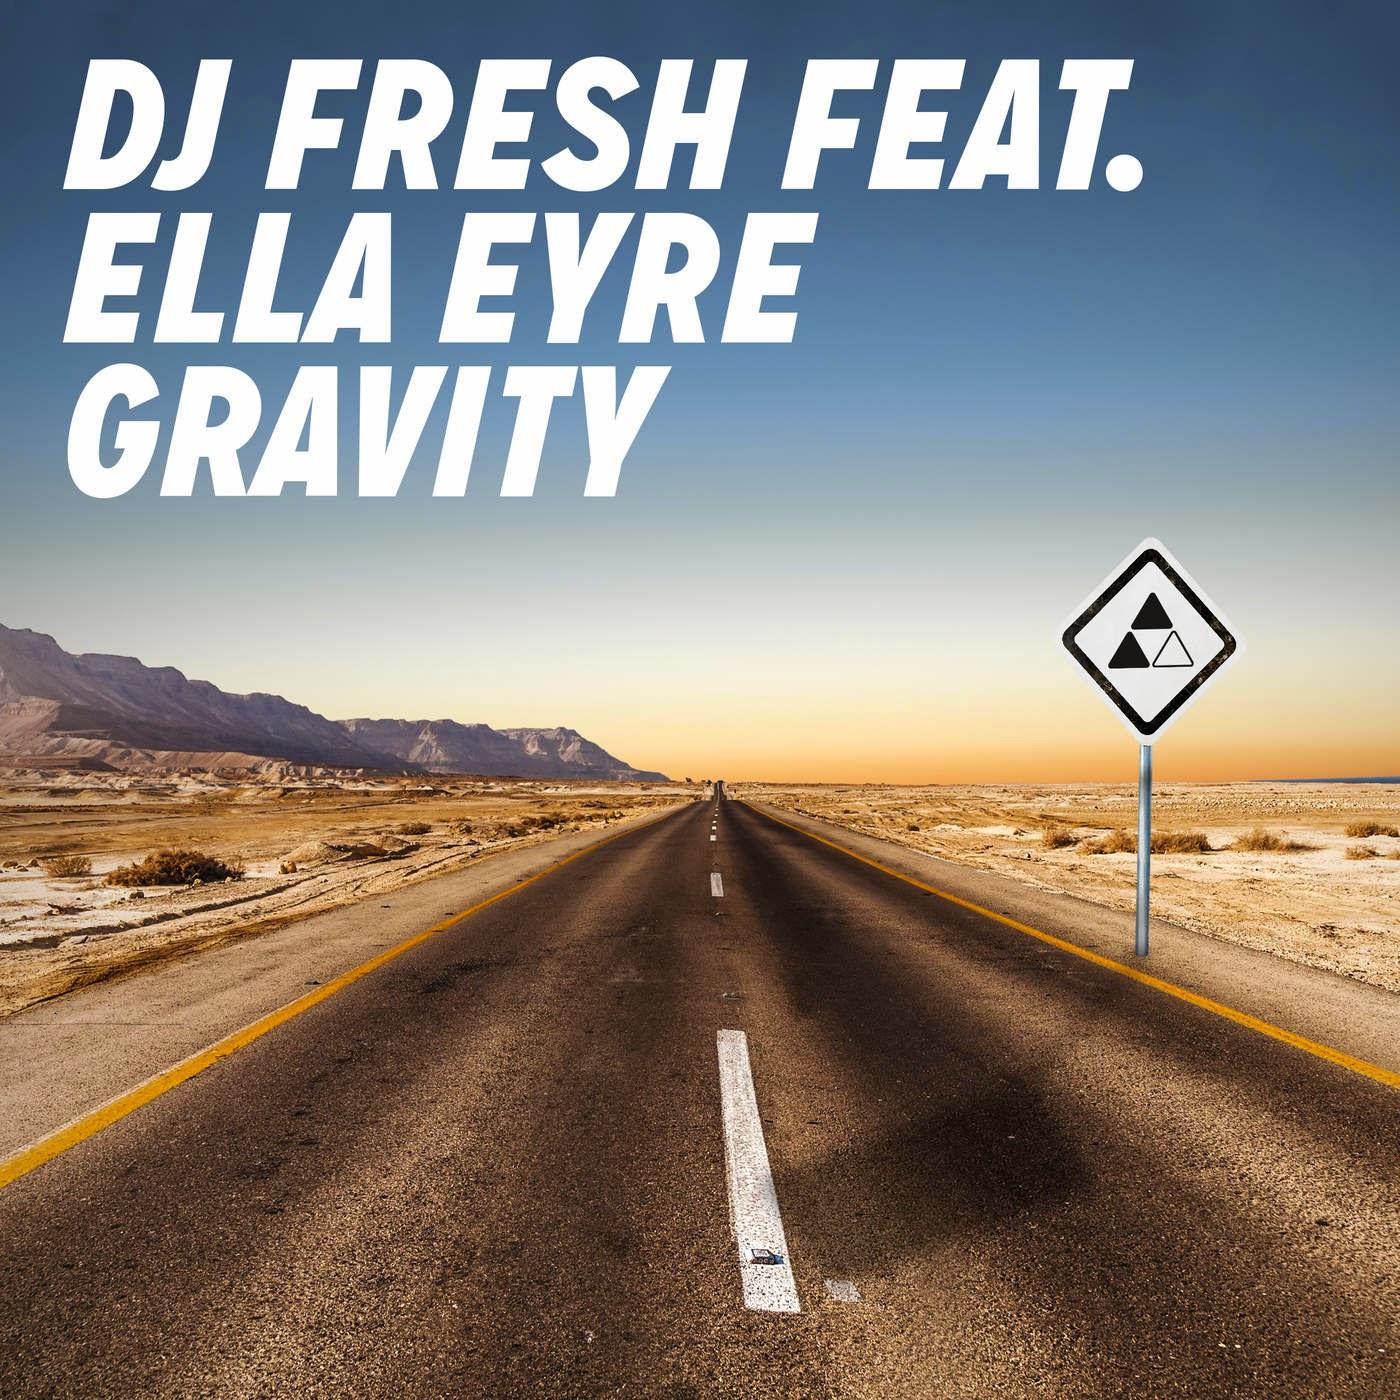 DJ Fresh - Gravity (feat. Ella Eyre) - Single Cover